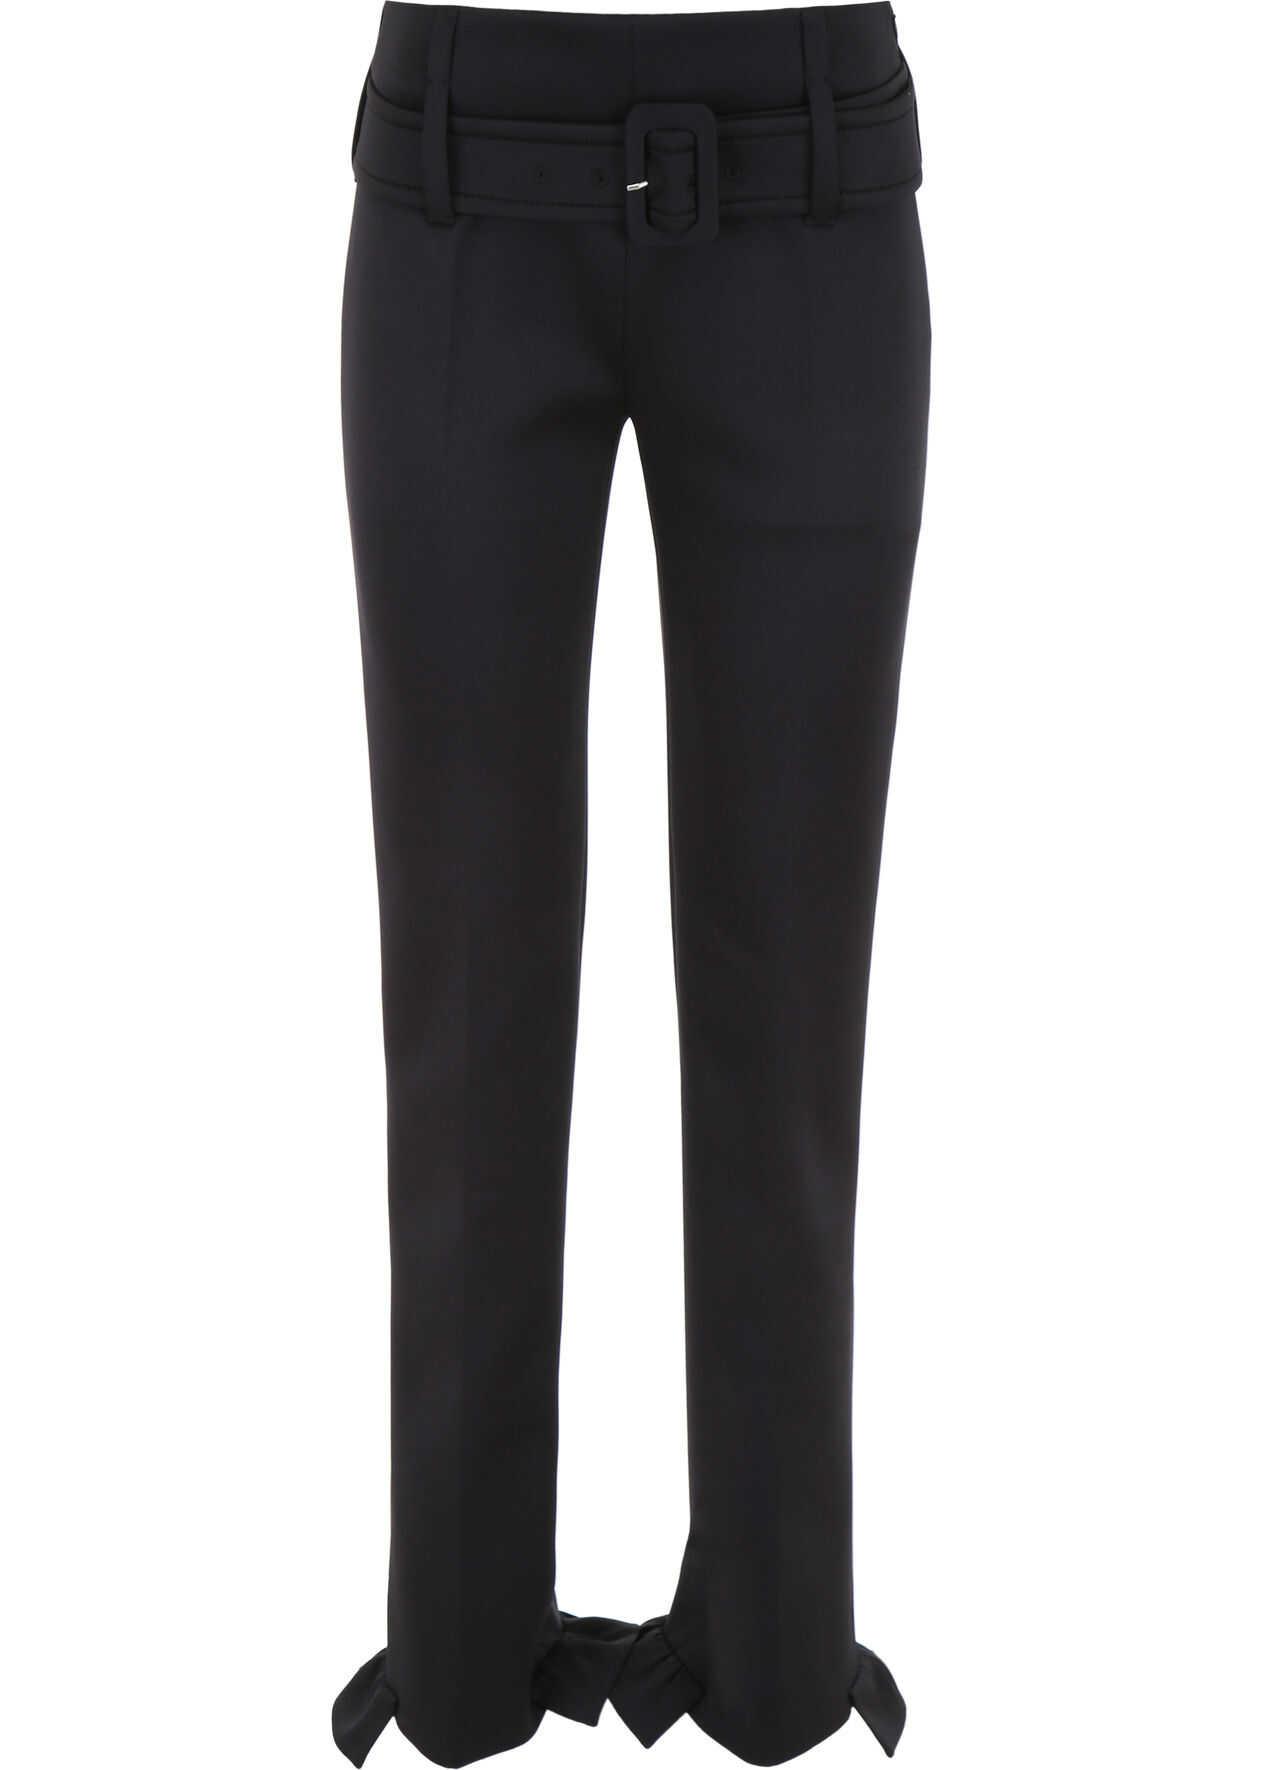 Prada Formal Trousers NERO NERO